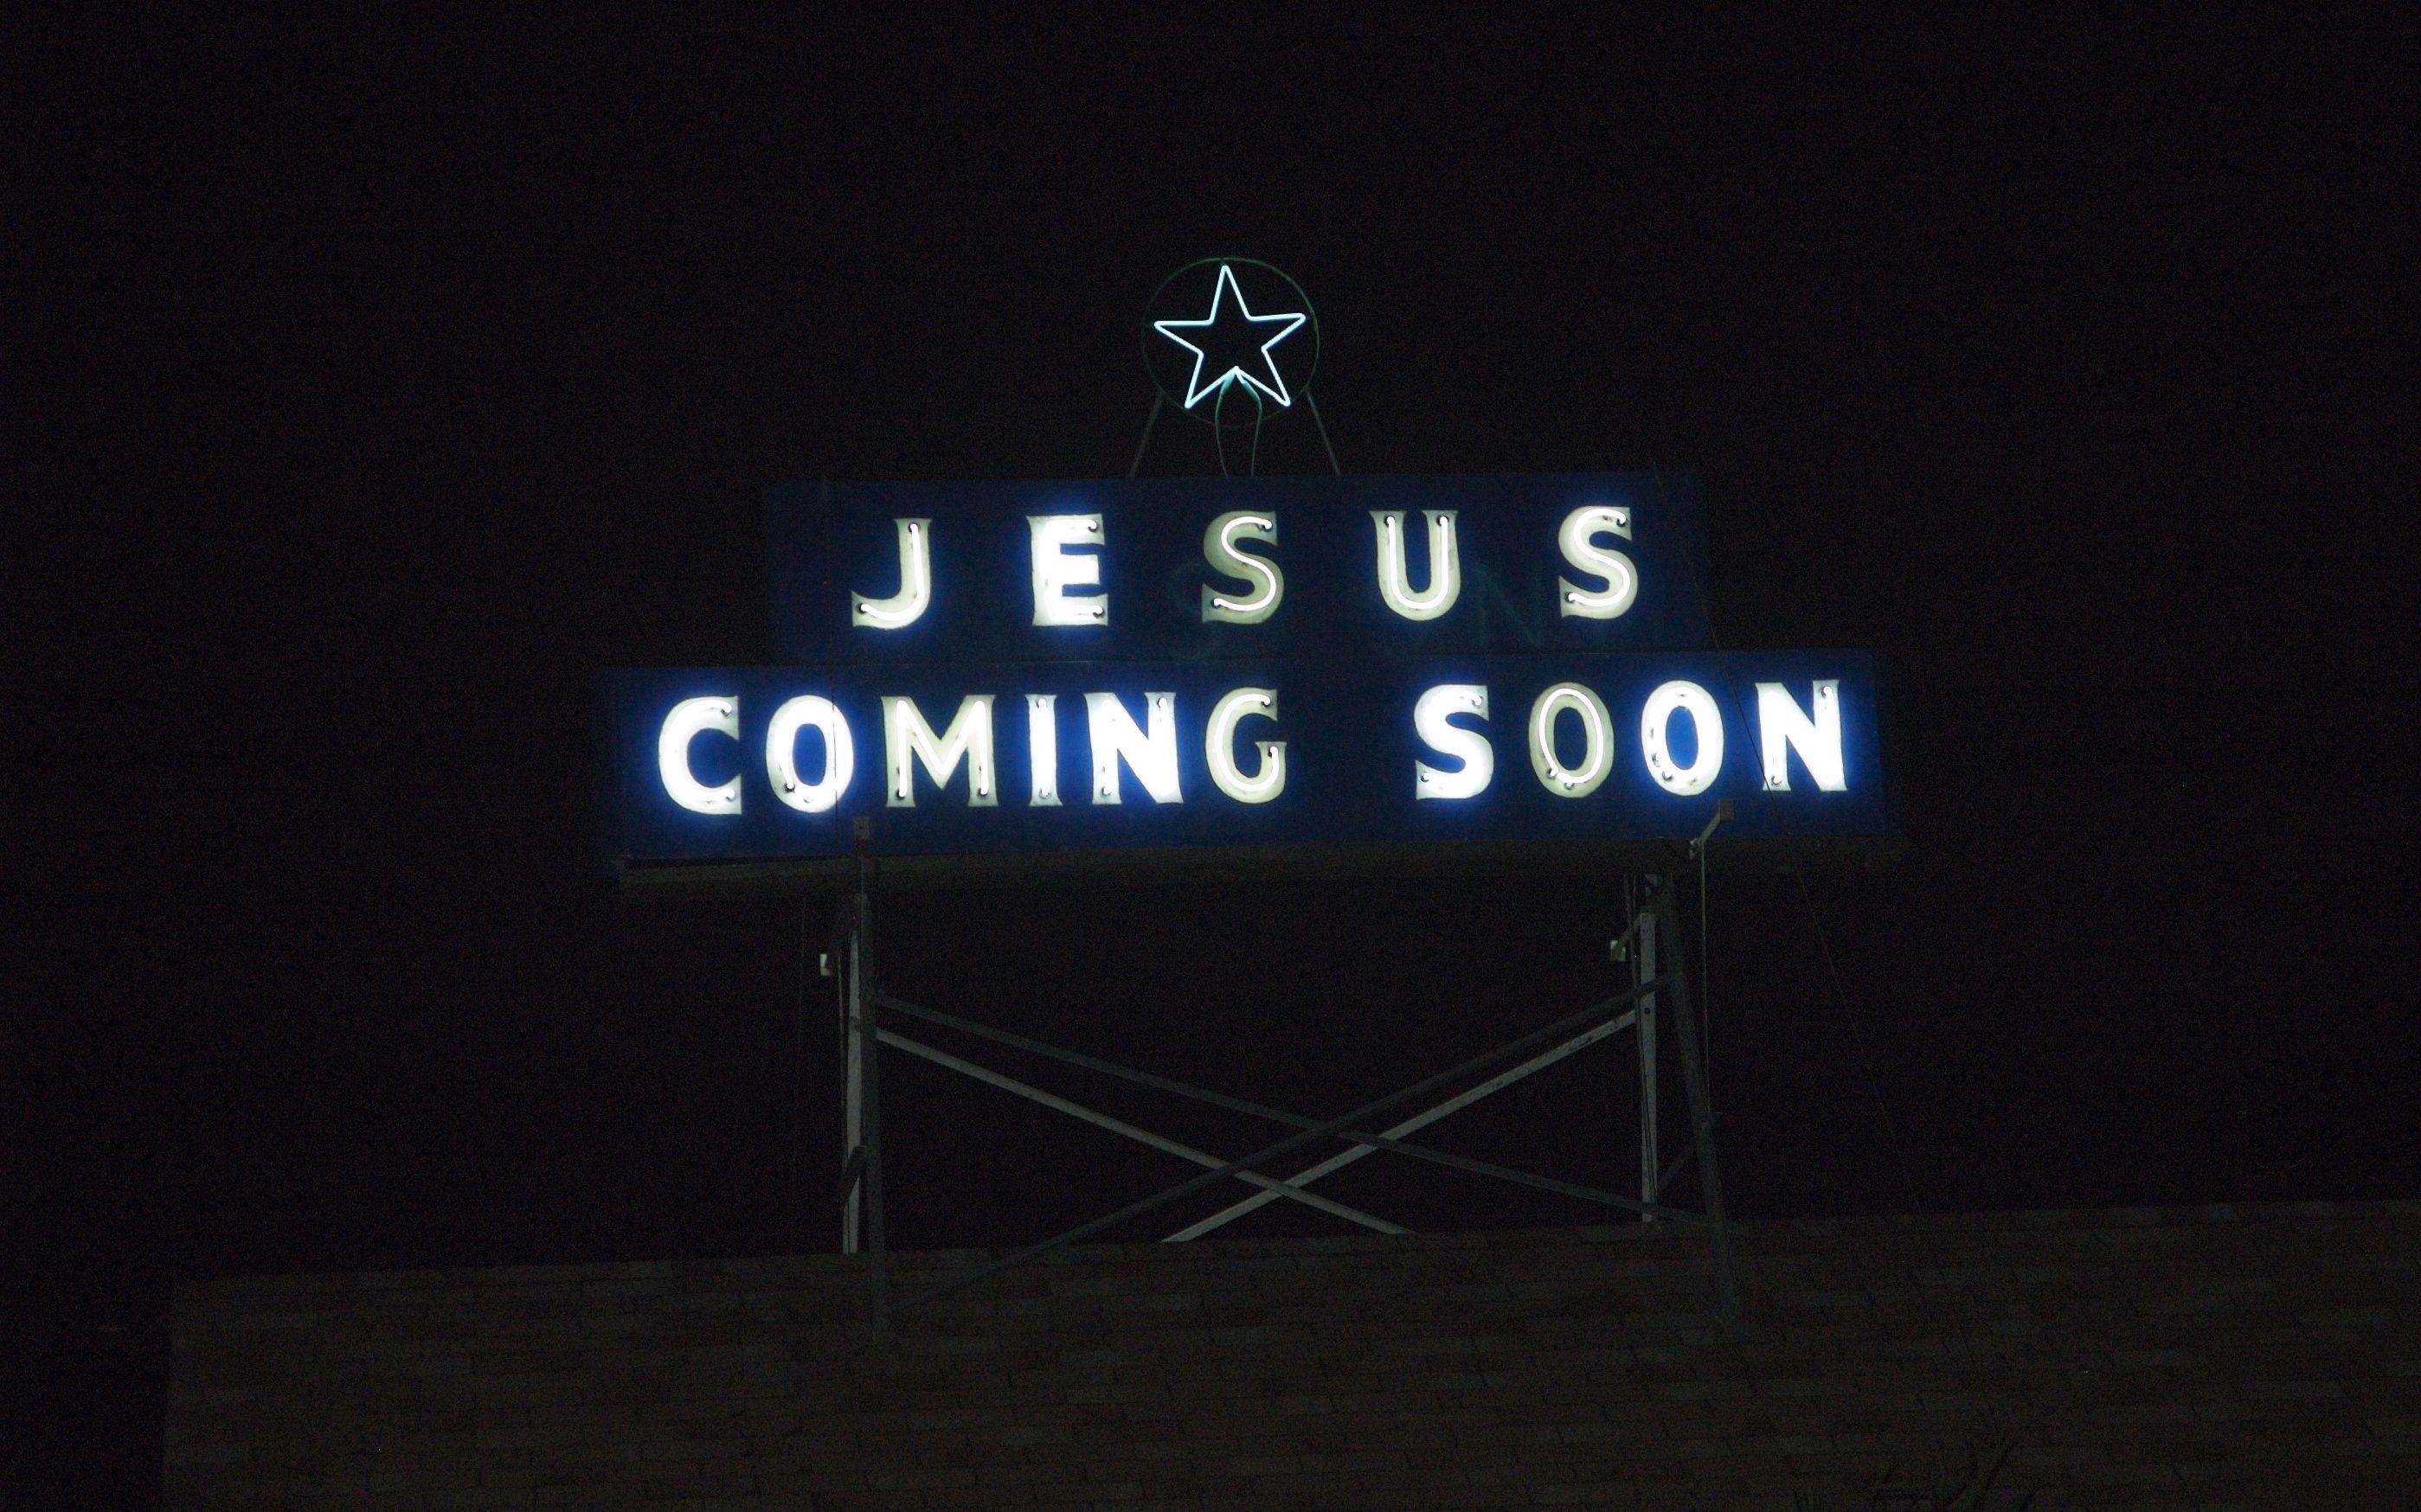 Jesus Coming Soon Wallpapers Wallpaper Cave